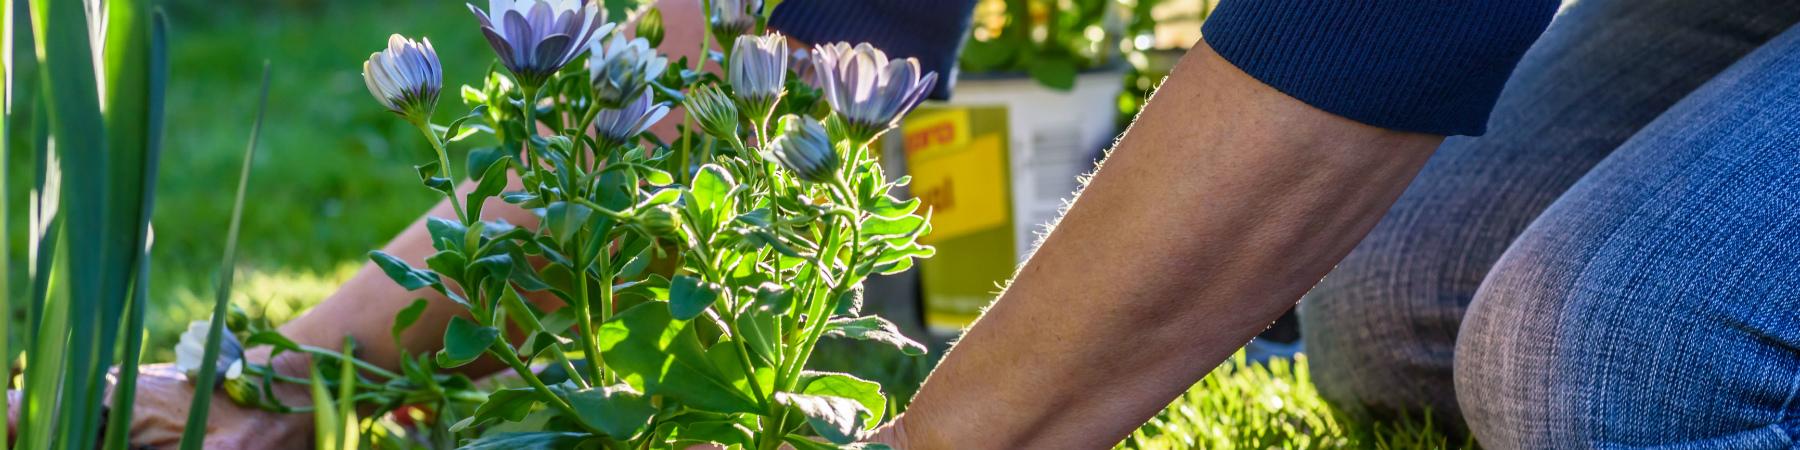 Woman planting purple flowers